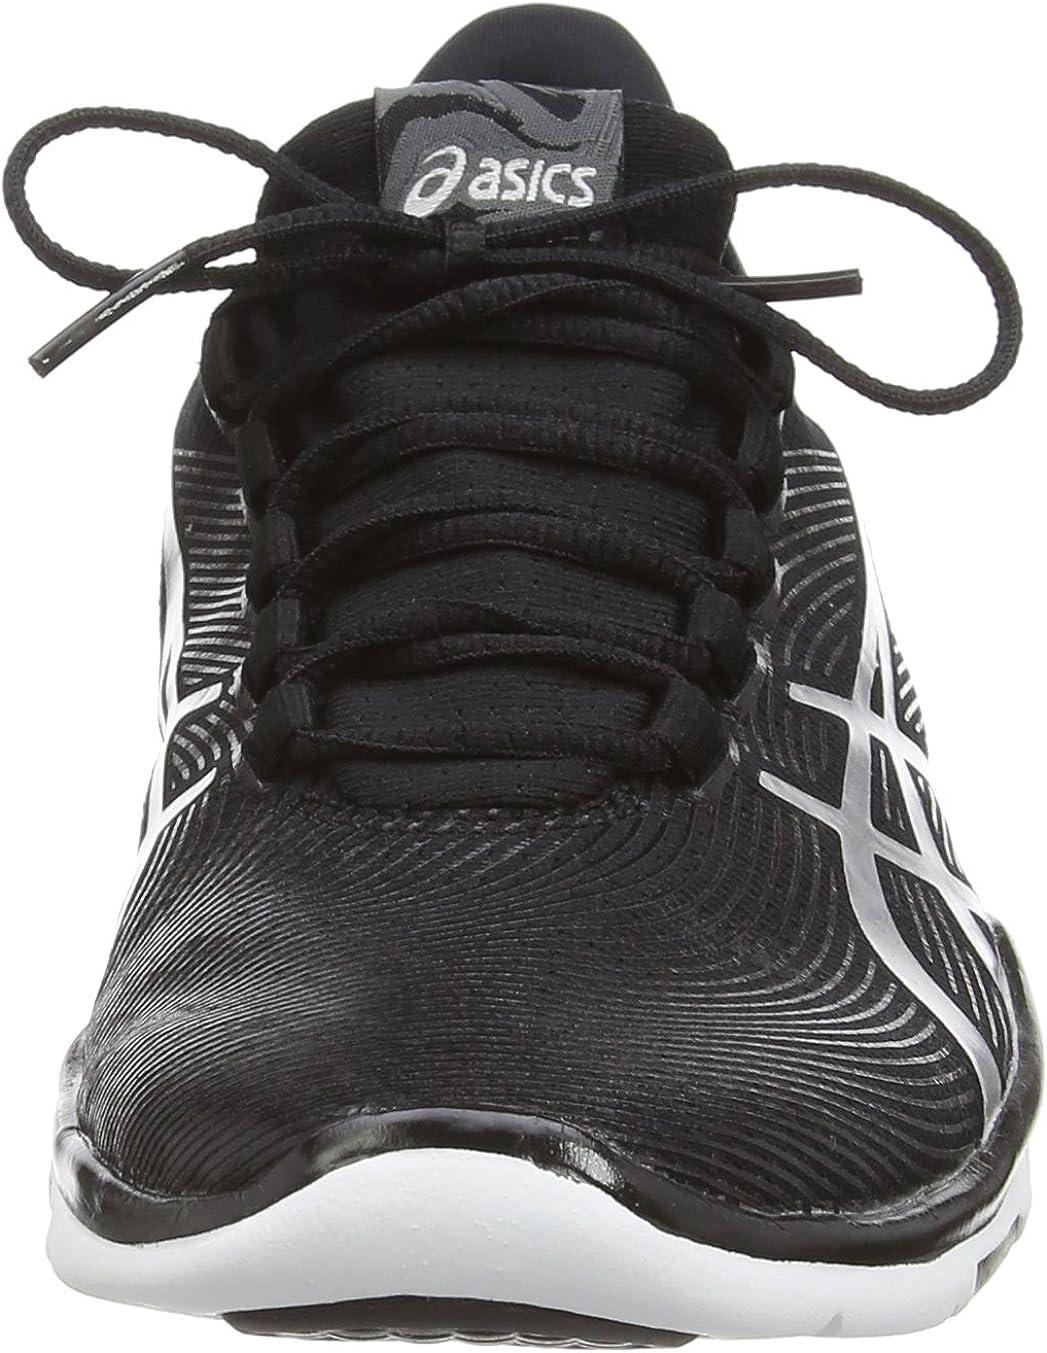 ASICS Gel Fit Sana 2, Sneakers da Donna: Amazon.it: Scarpe e